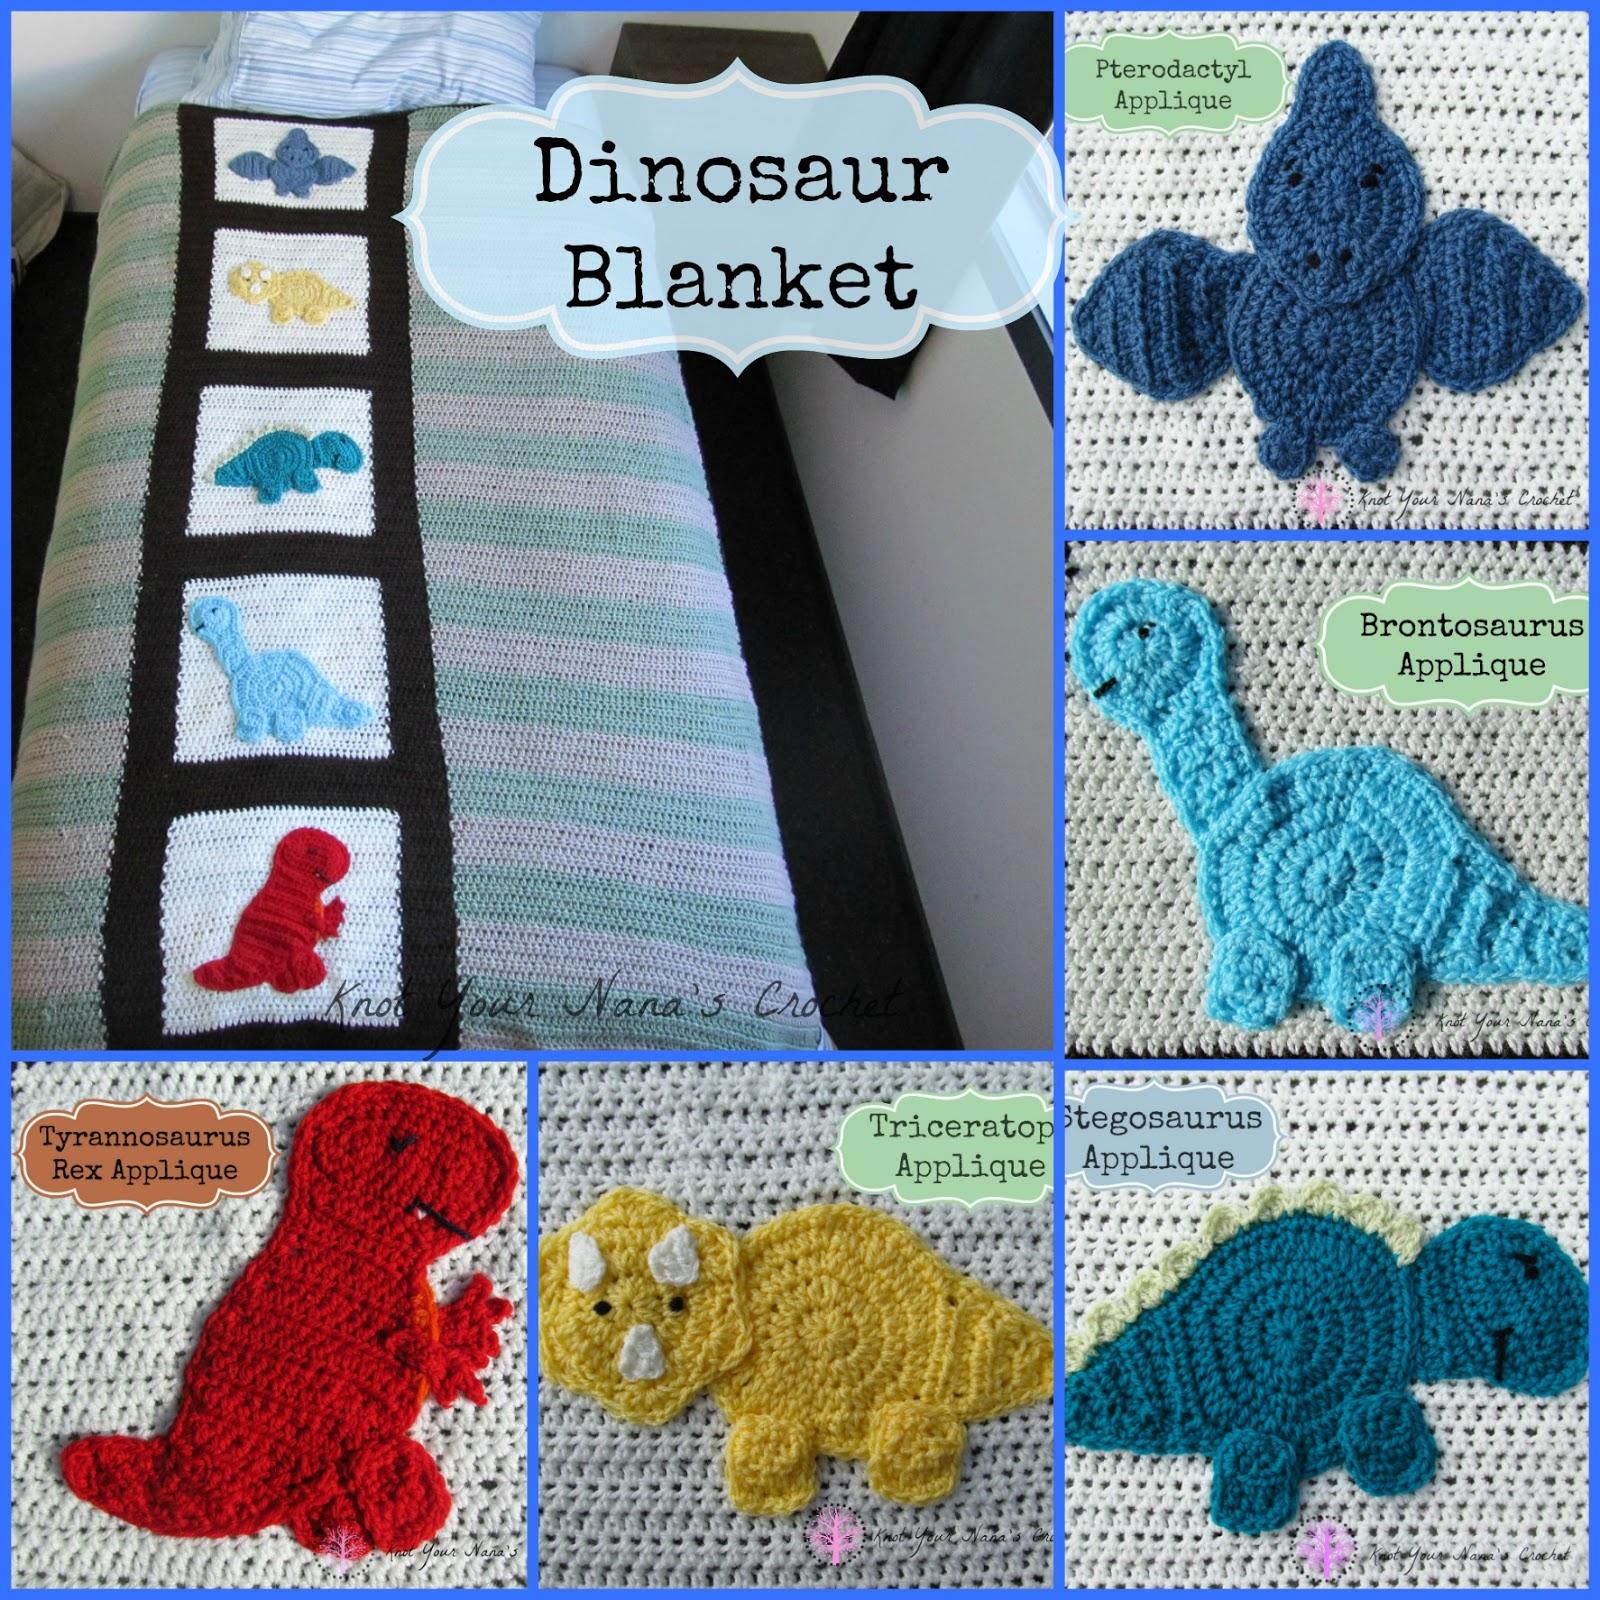 Giant Amigurumi Dinosaur! | PlanetJune by June Gilbank: Blog | 1600x1600